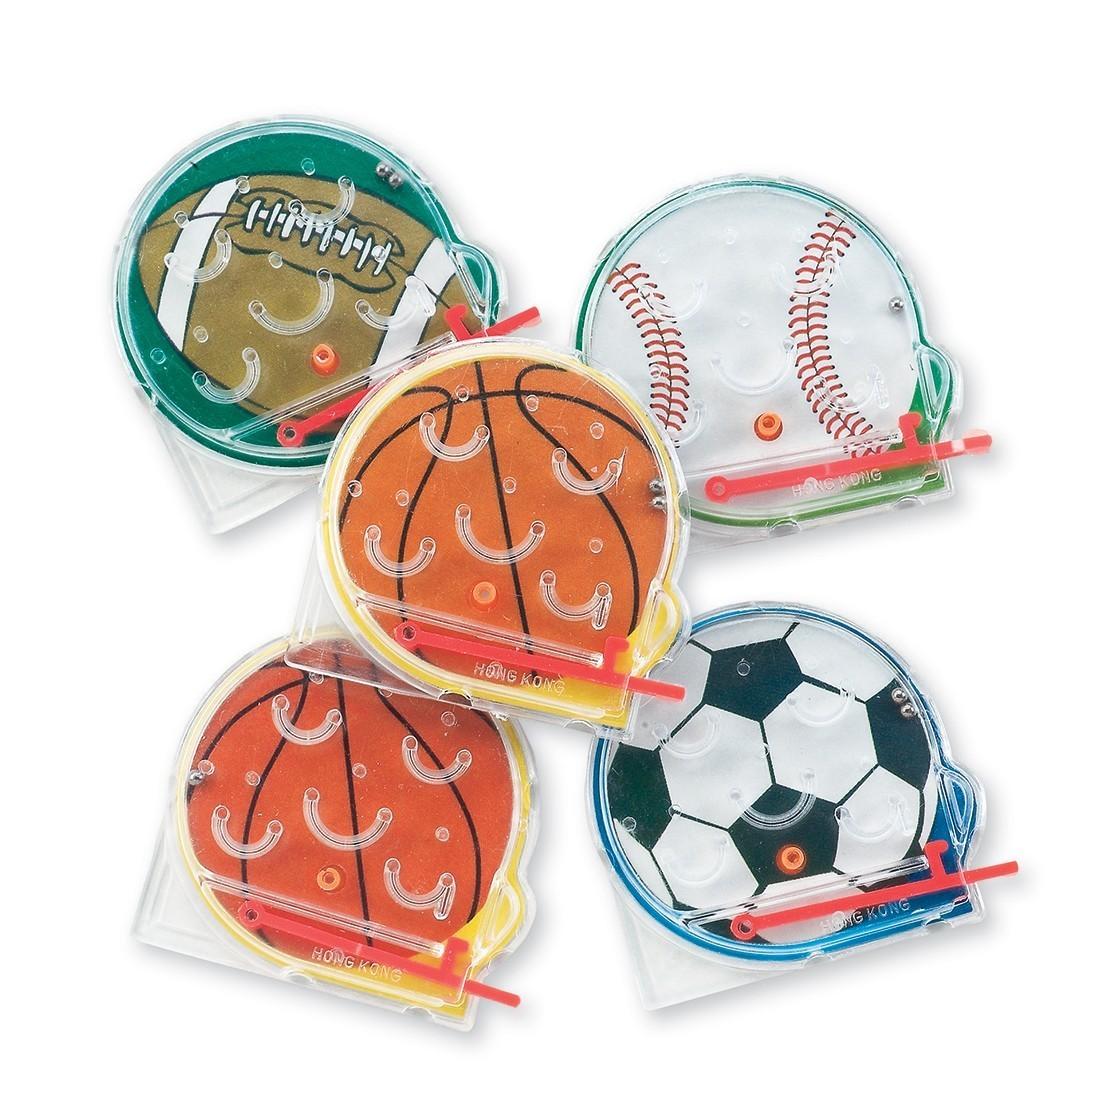 Sports Pinball Games [image]